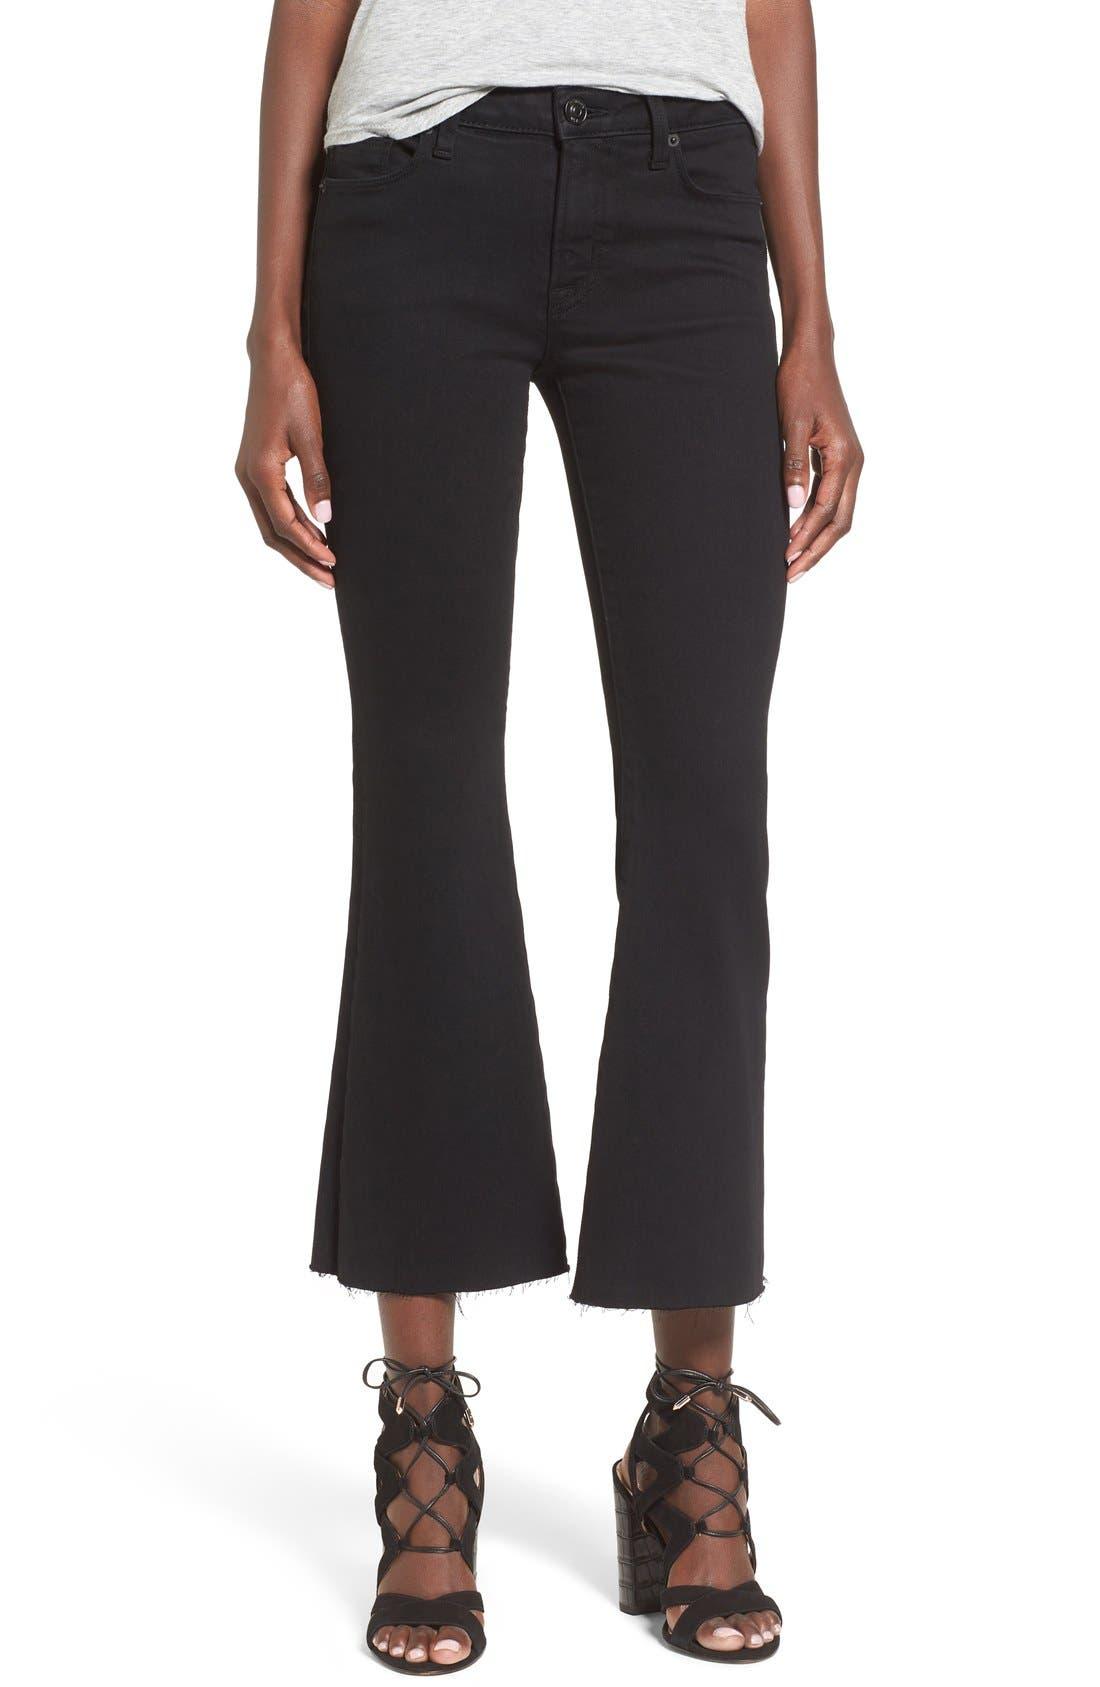 Alternate Image 1 Selected - Hudson Jeans 'Mia' Raw Hem Crop Flare Jeans